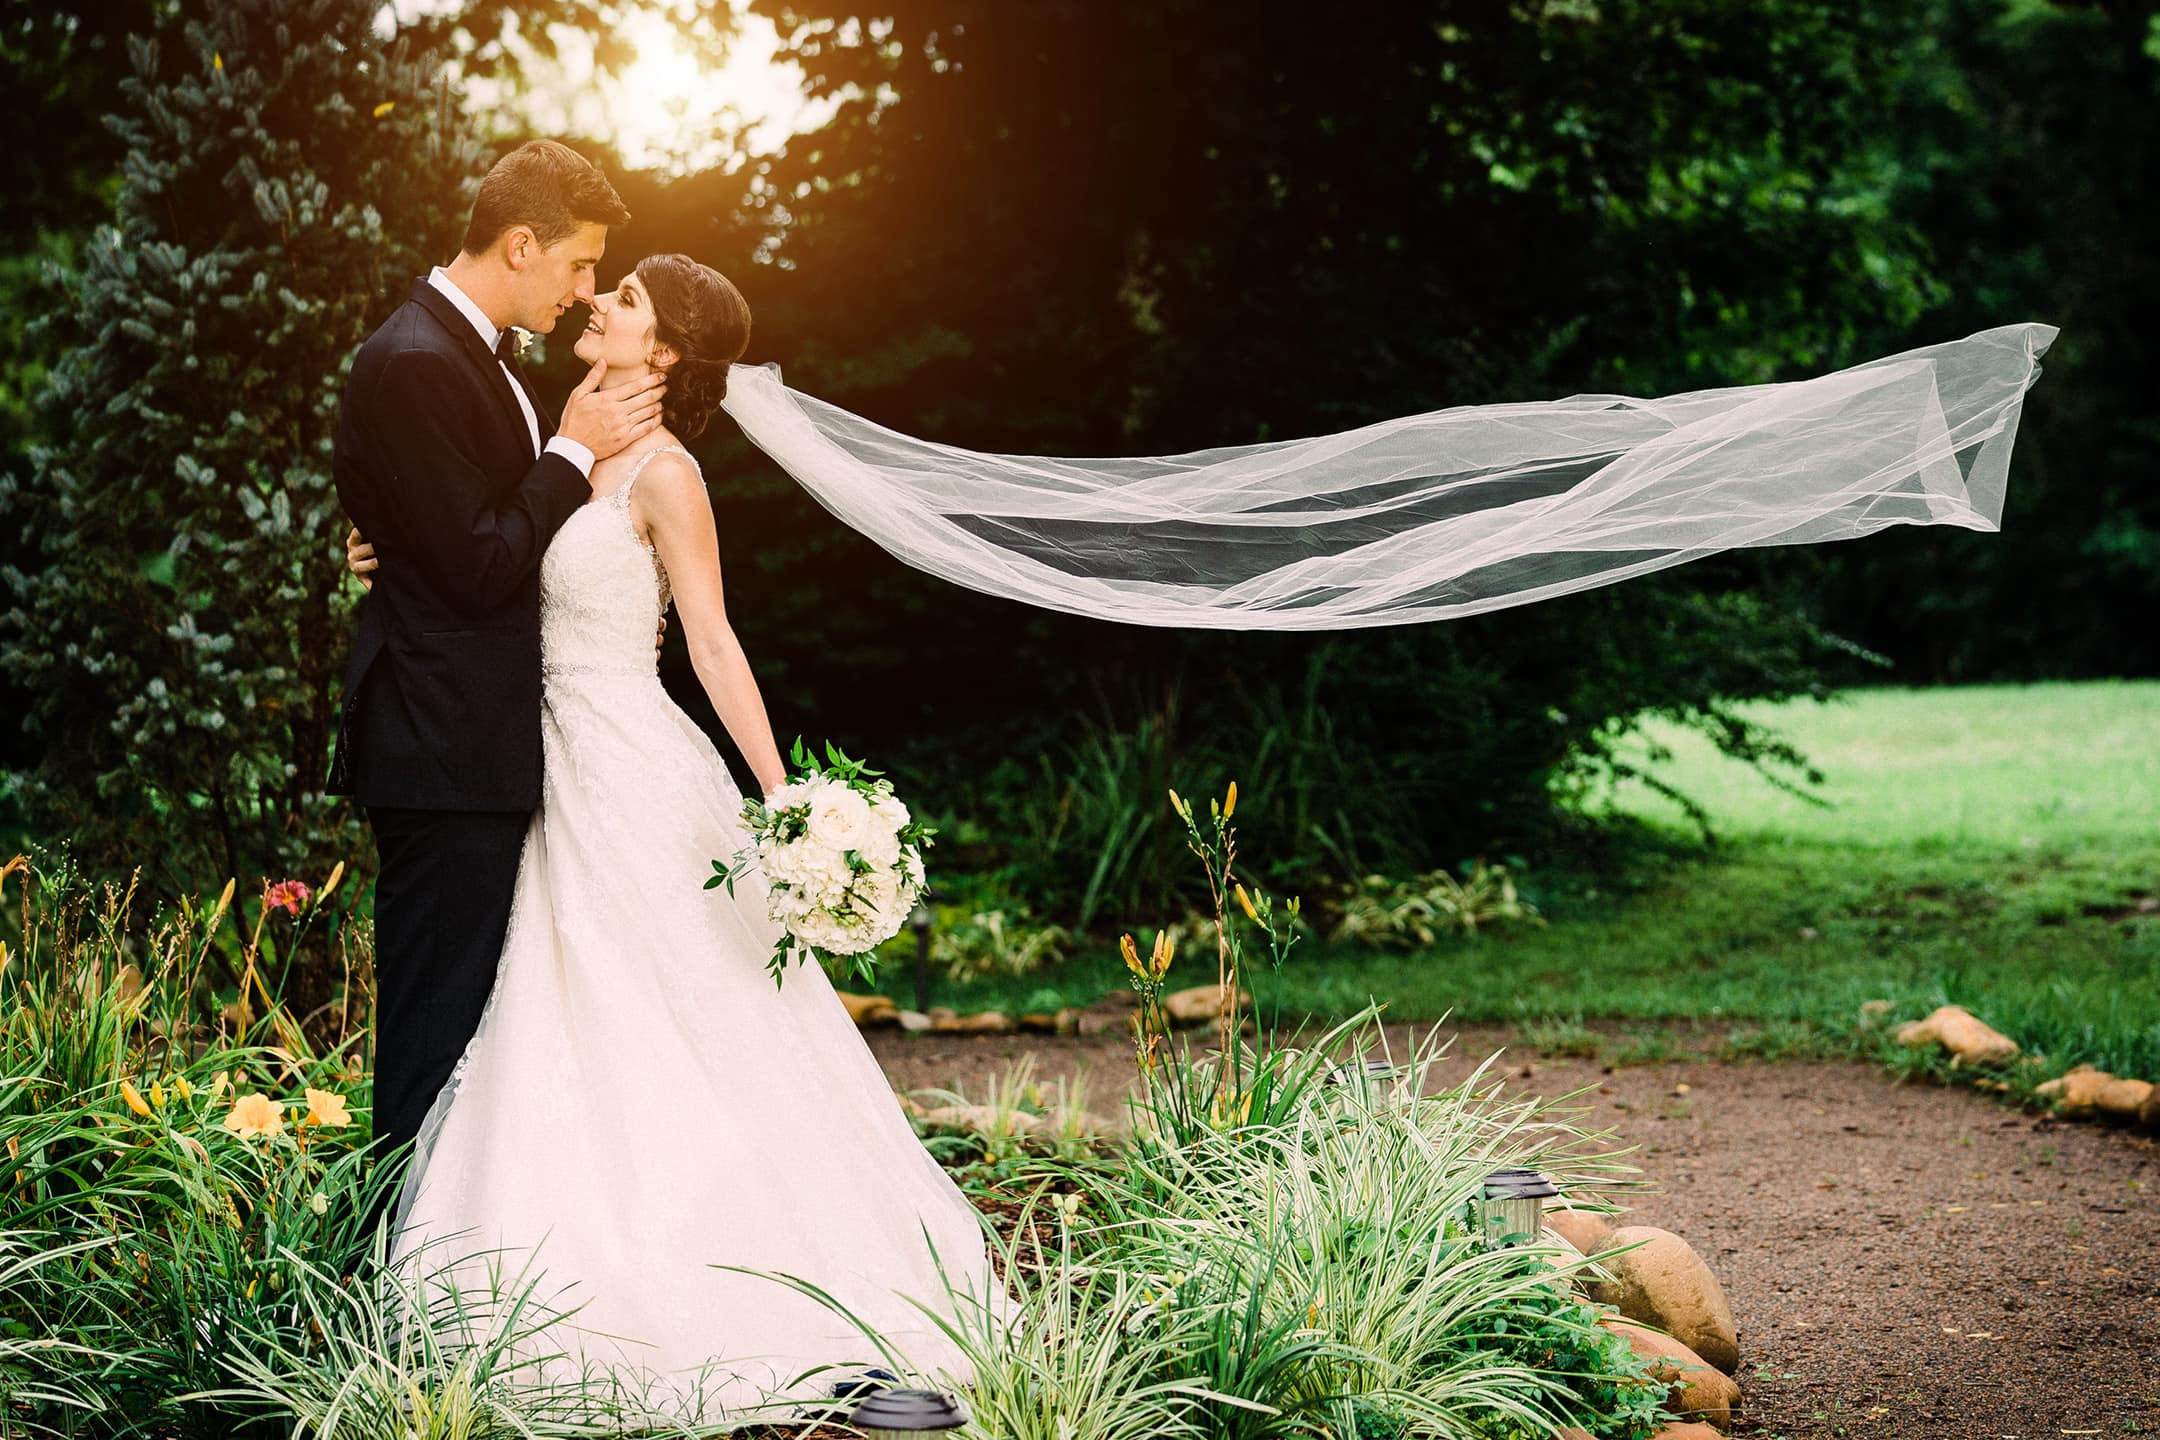 Bride and Groom embracing while her veil flies behind her